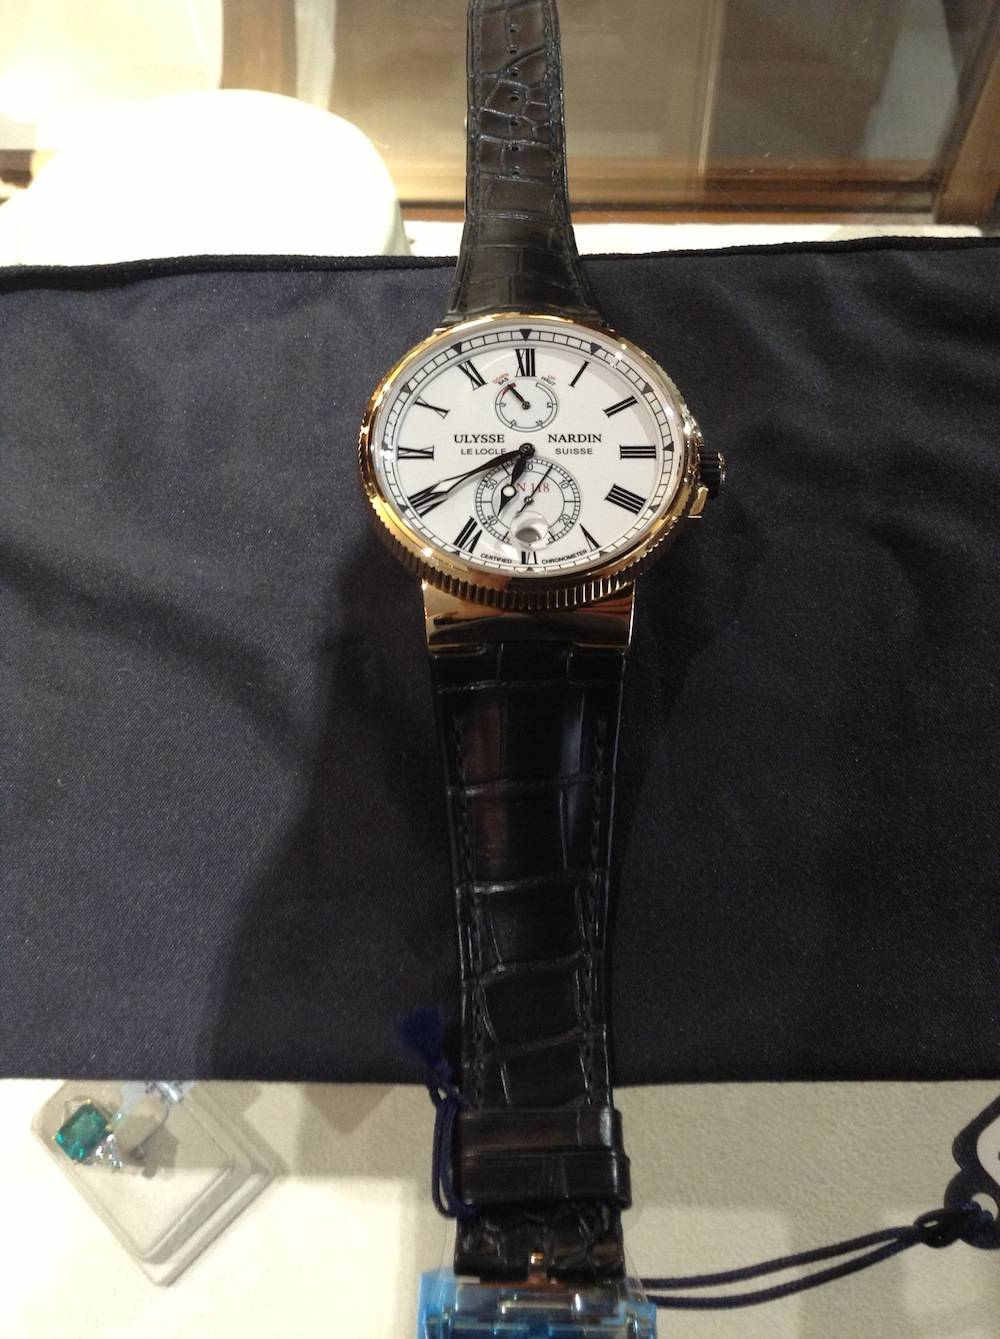 Ulysse Nardin 45mm Chronometer